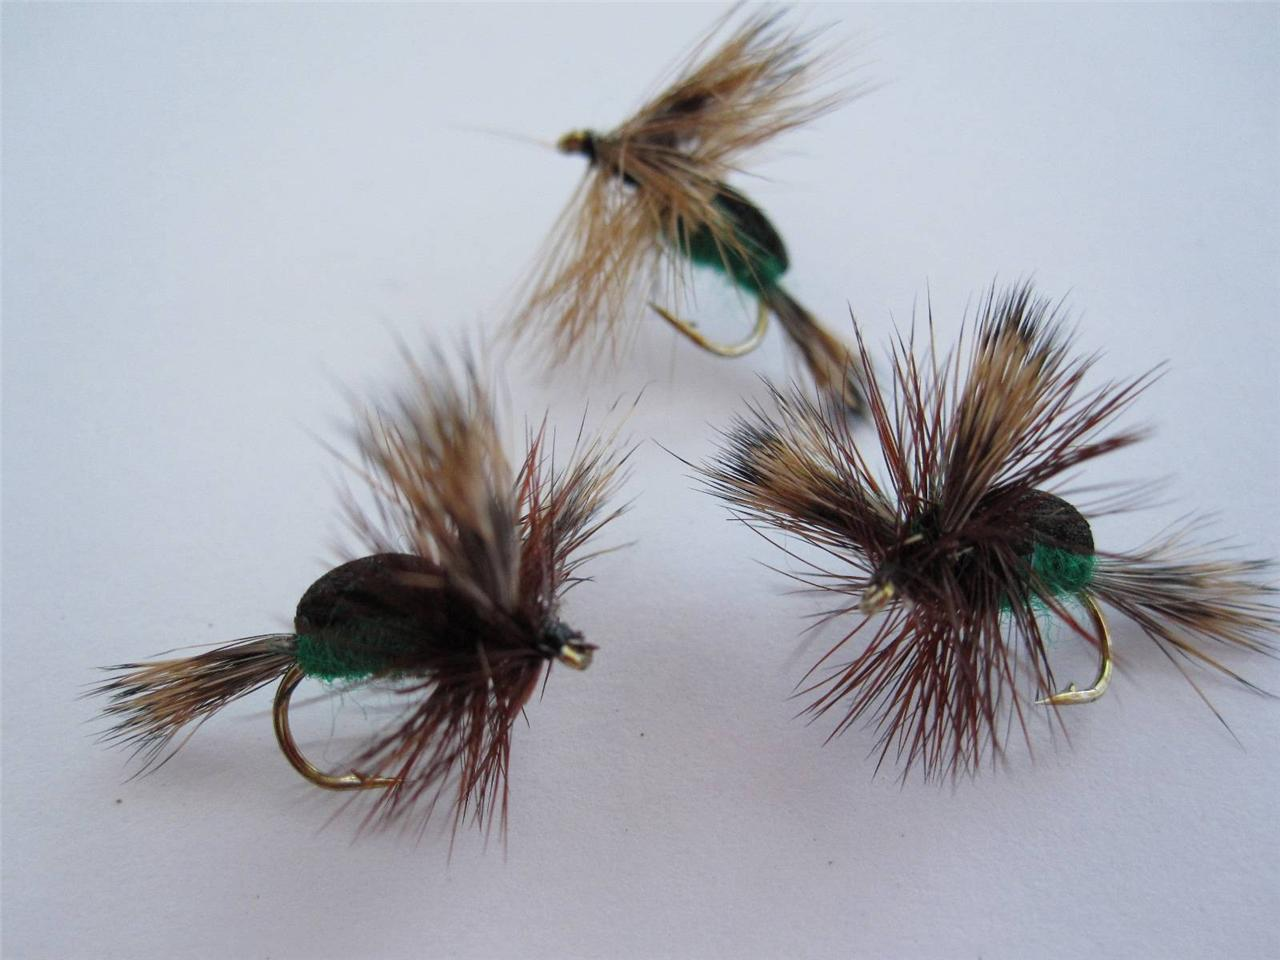 1 DZ 14-4 FOAM BACK HUMPY'S (COLORS & SIZES), DRY FLIES